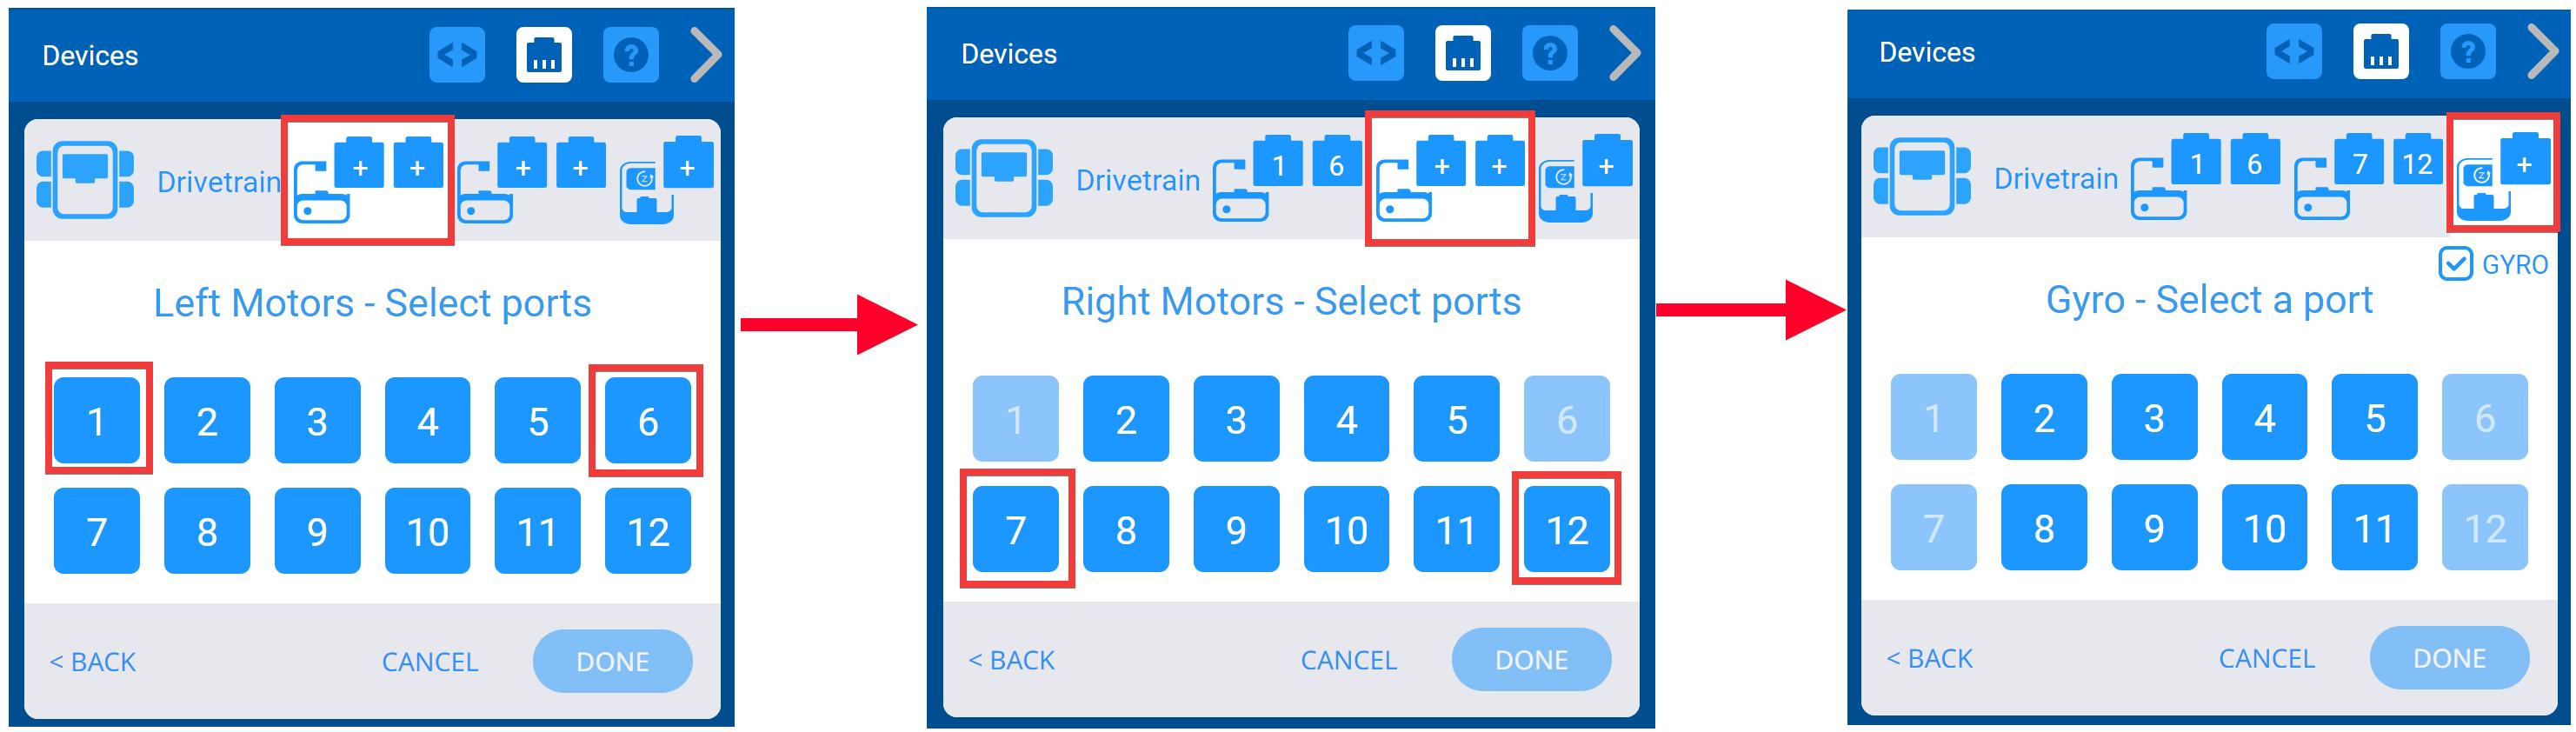 drivetrain_4_motors_group_select.png